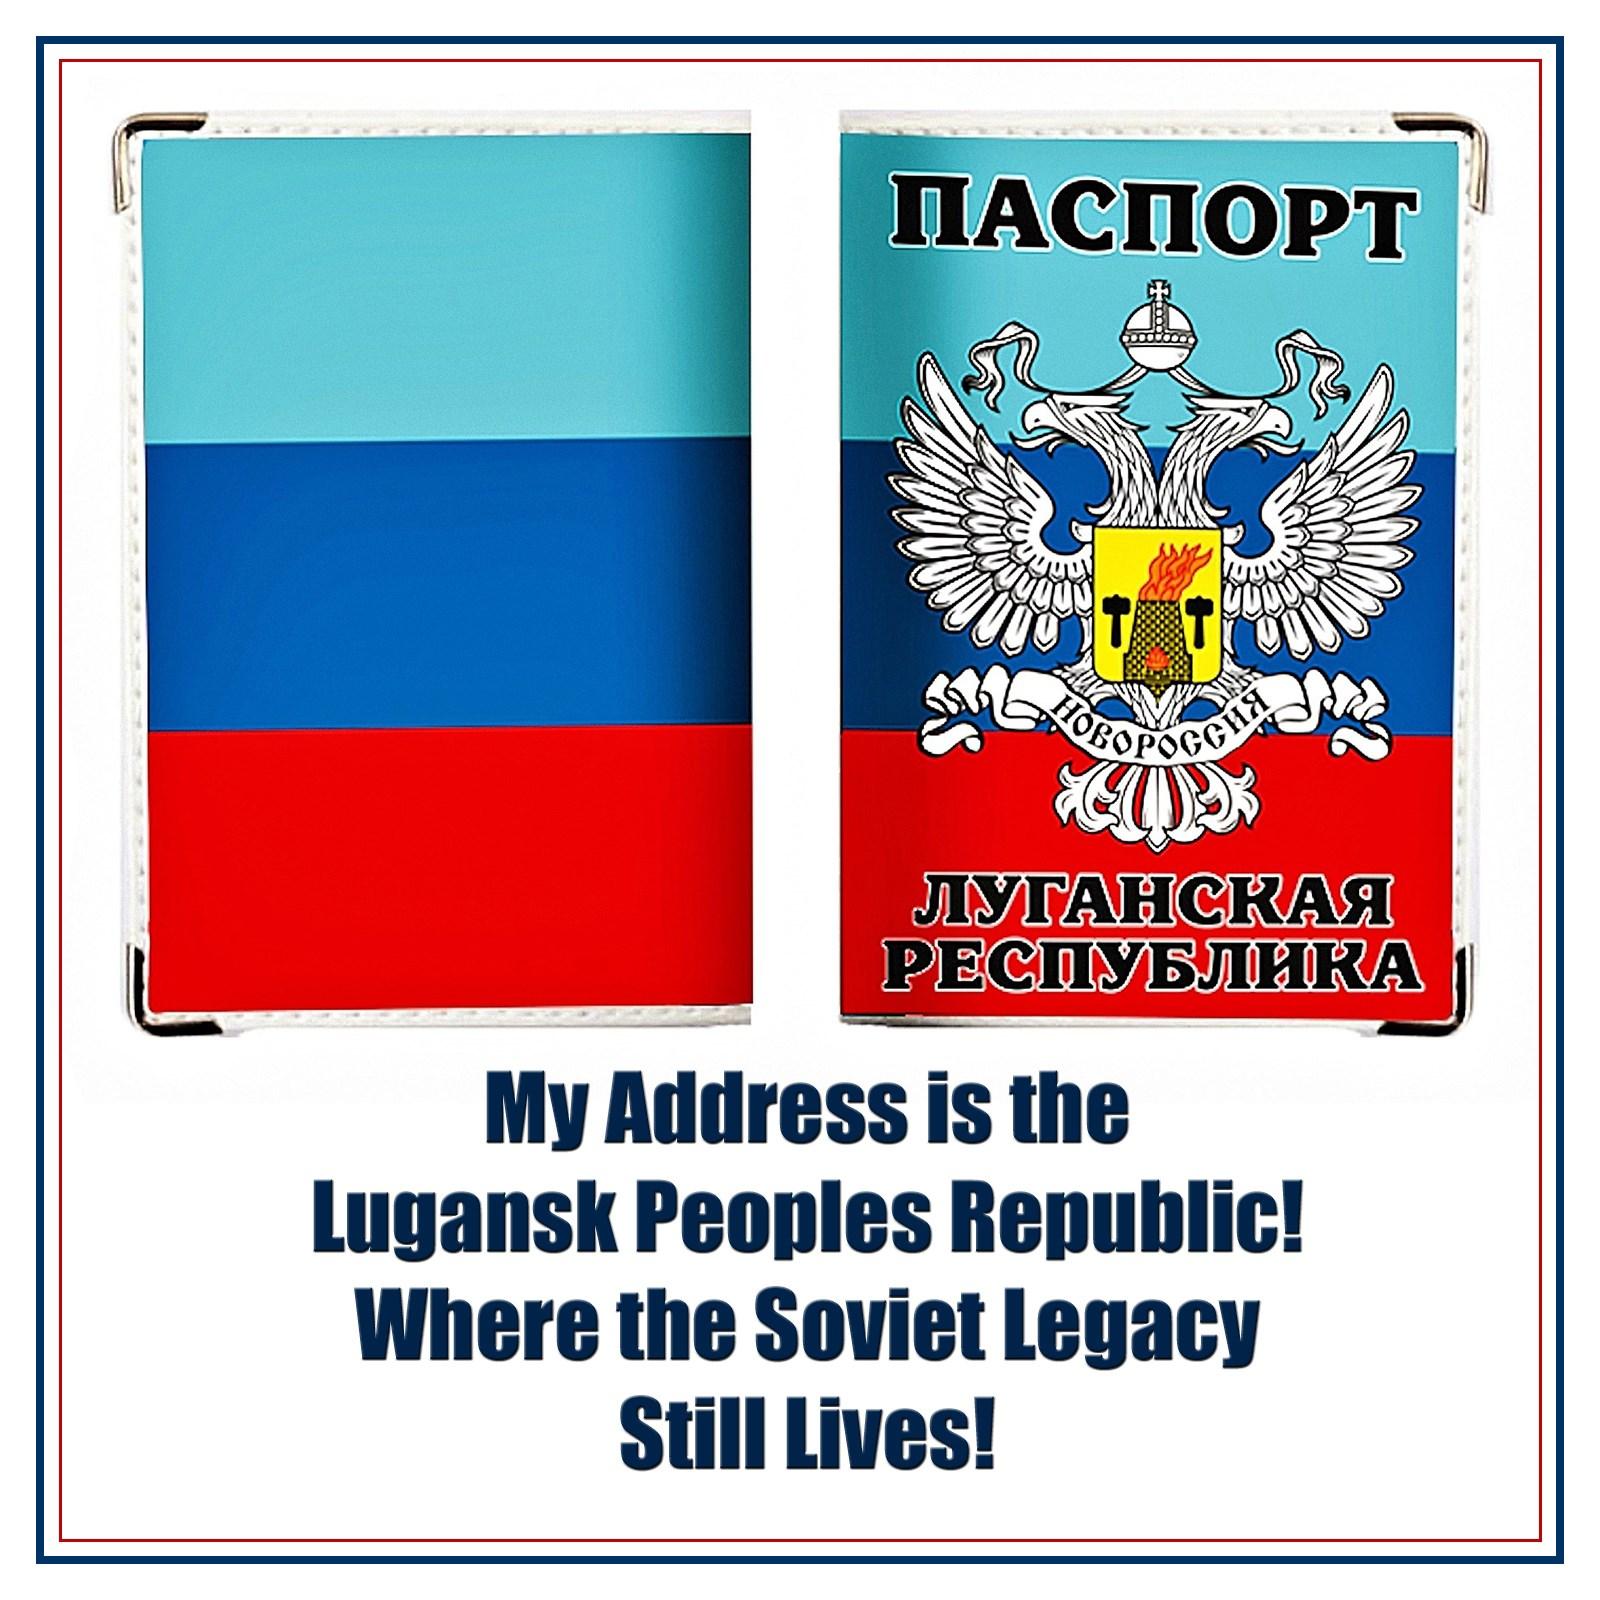 00 LNR Passport. 04.04.15